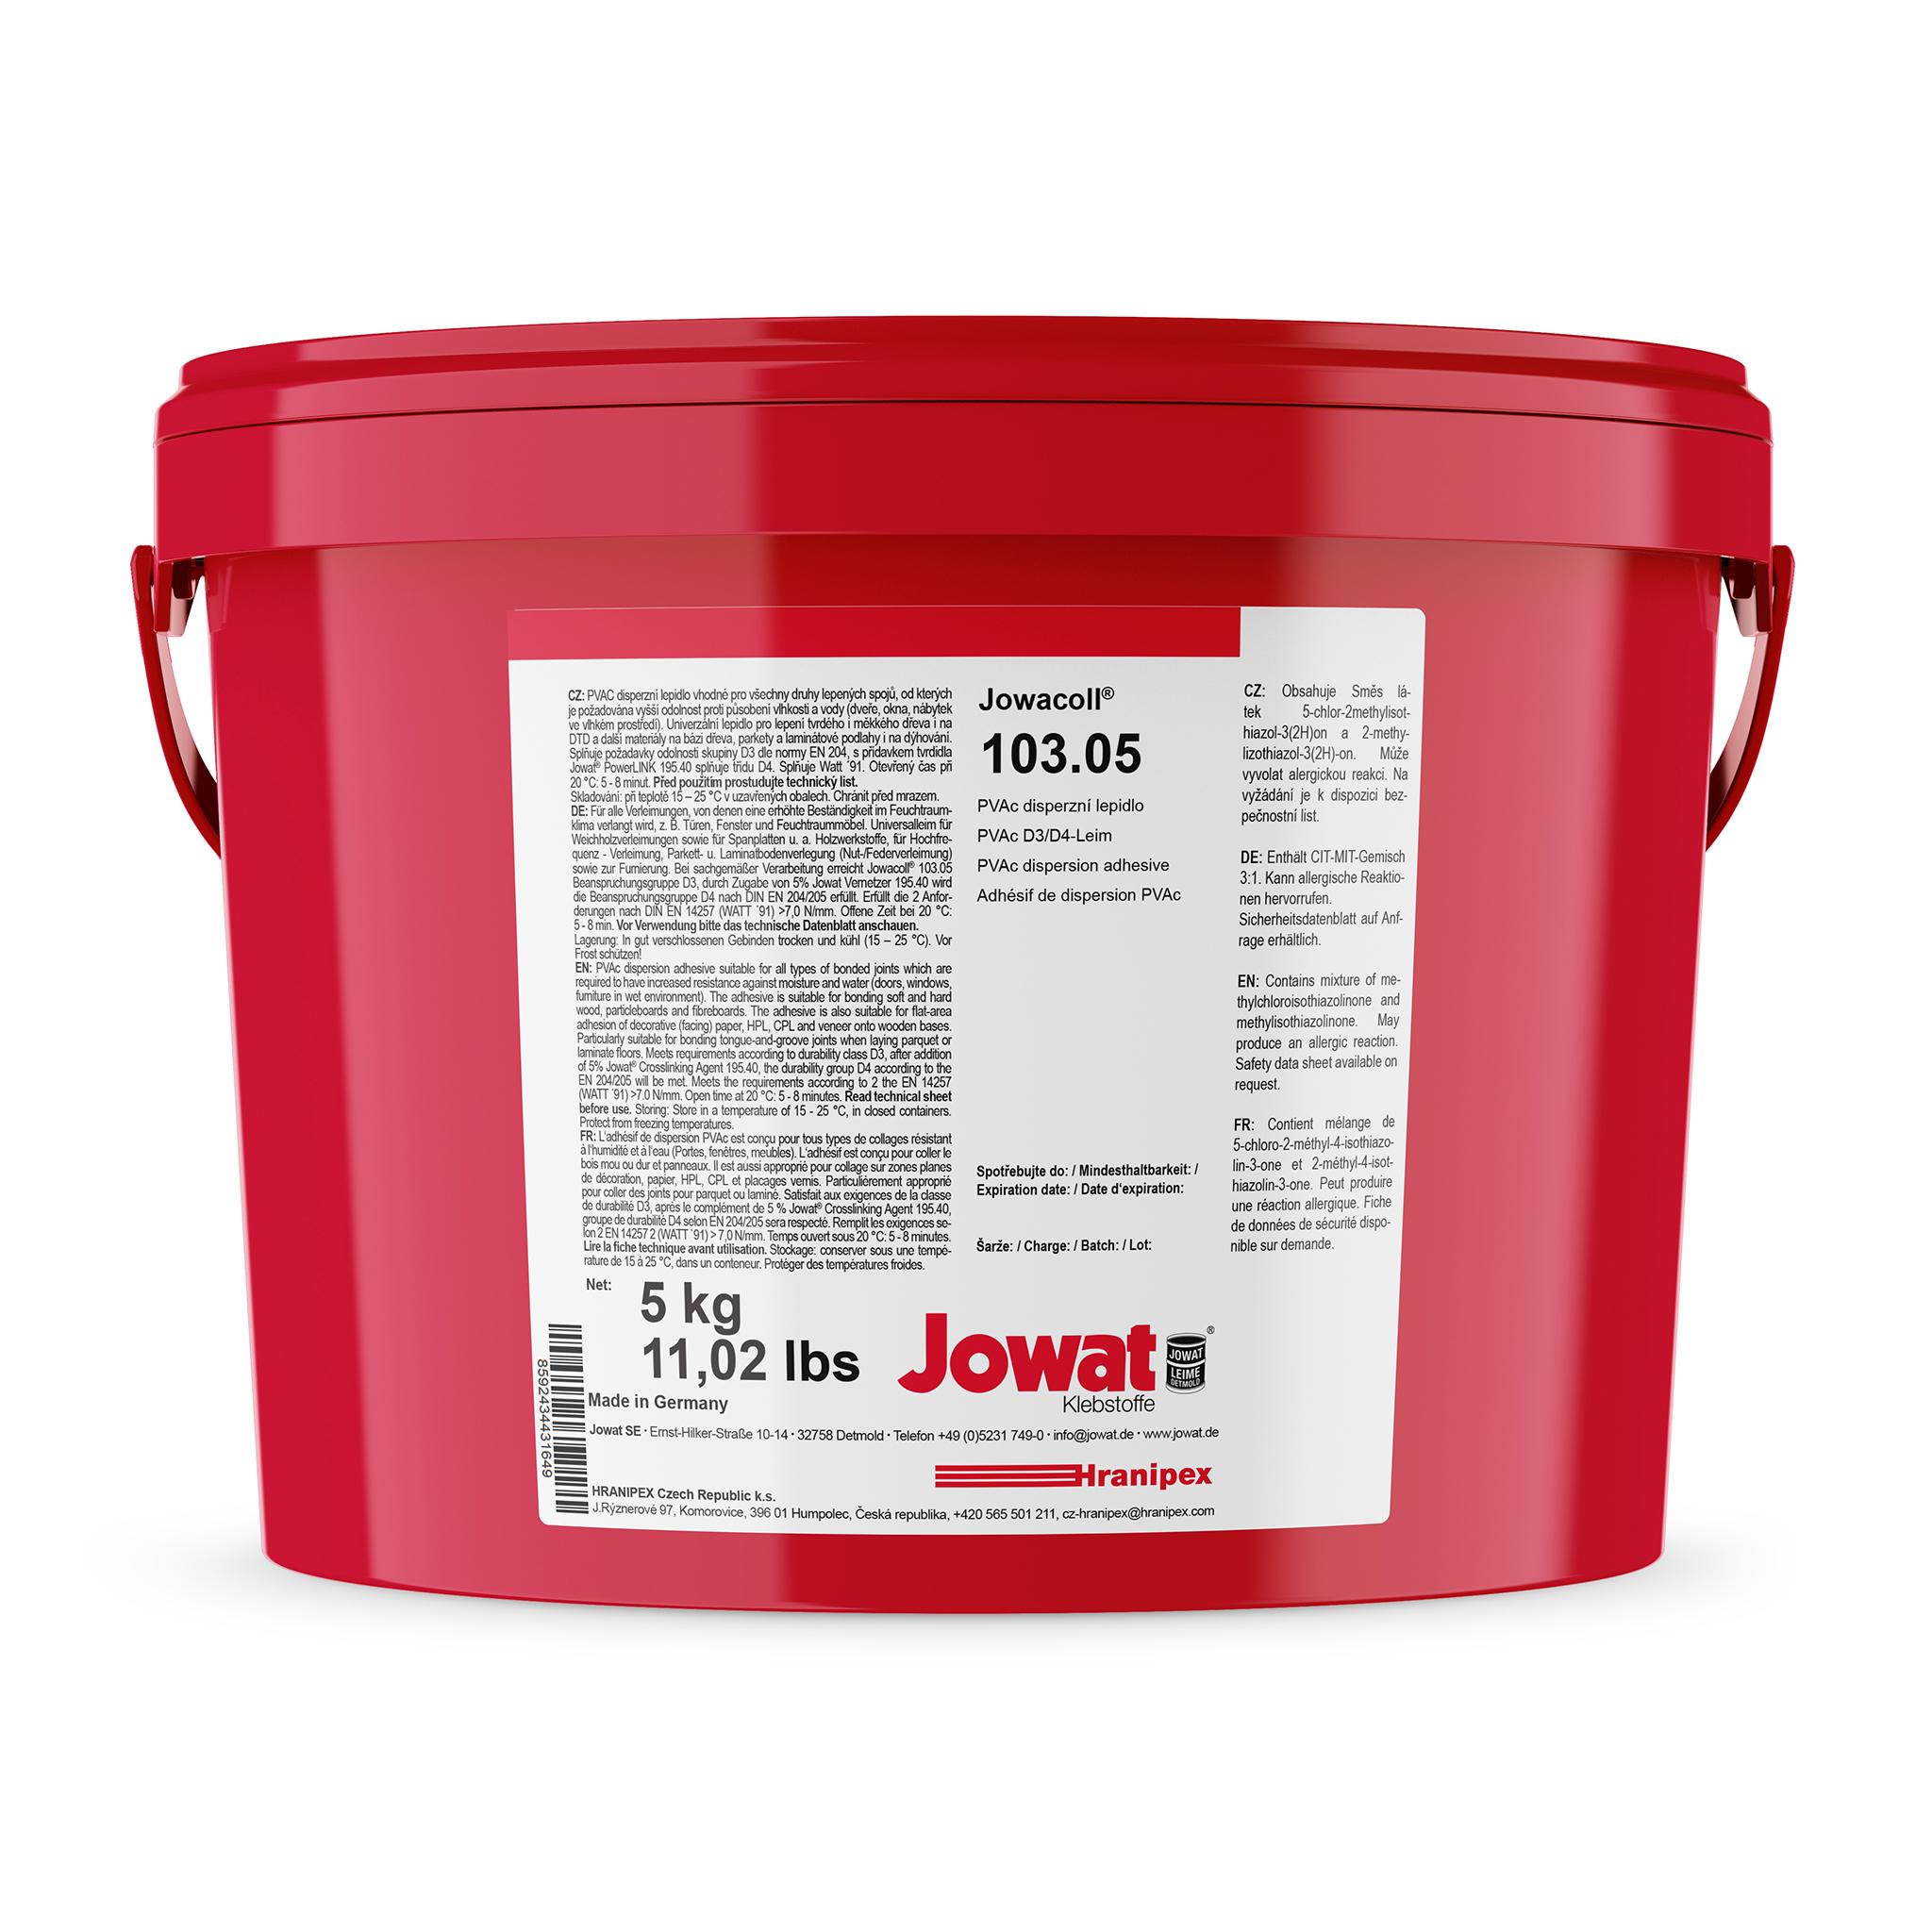 JOWACOLL 103.05 - PVAc Dispersive Adhesive